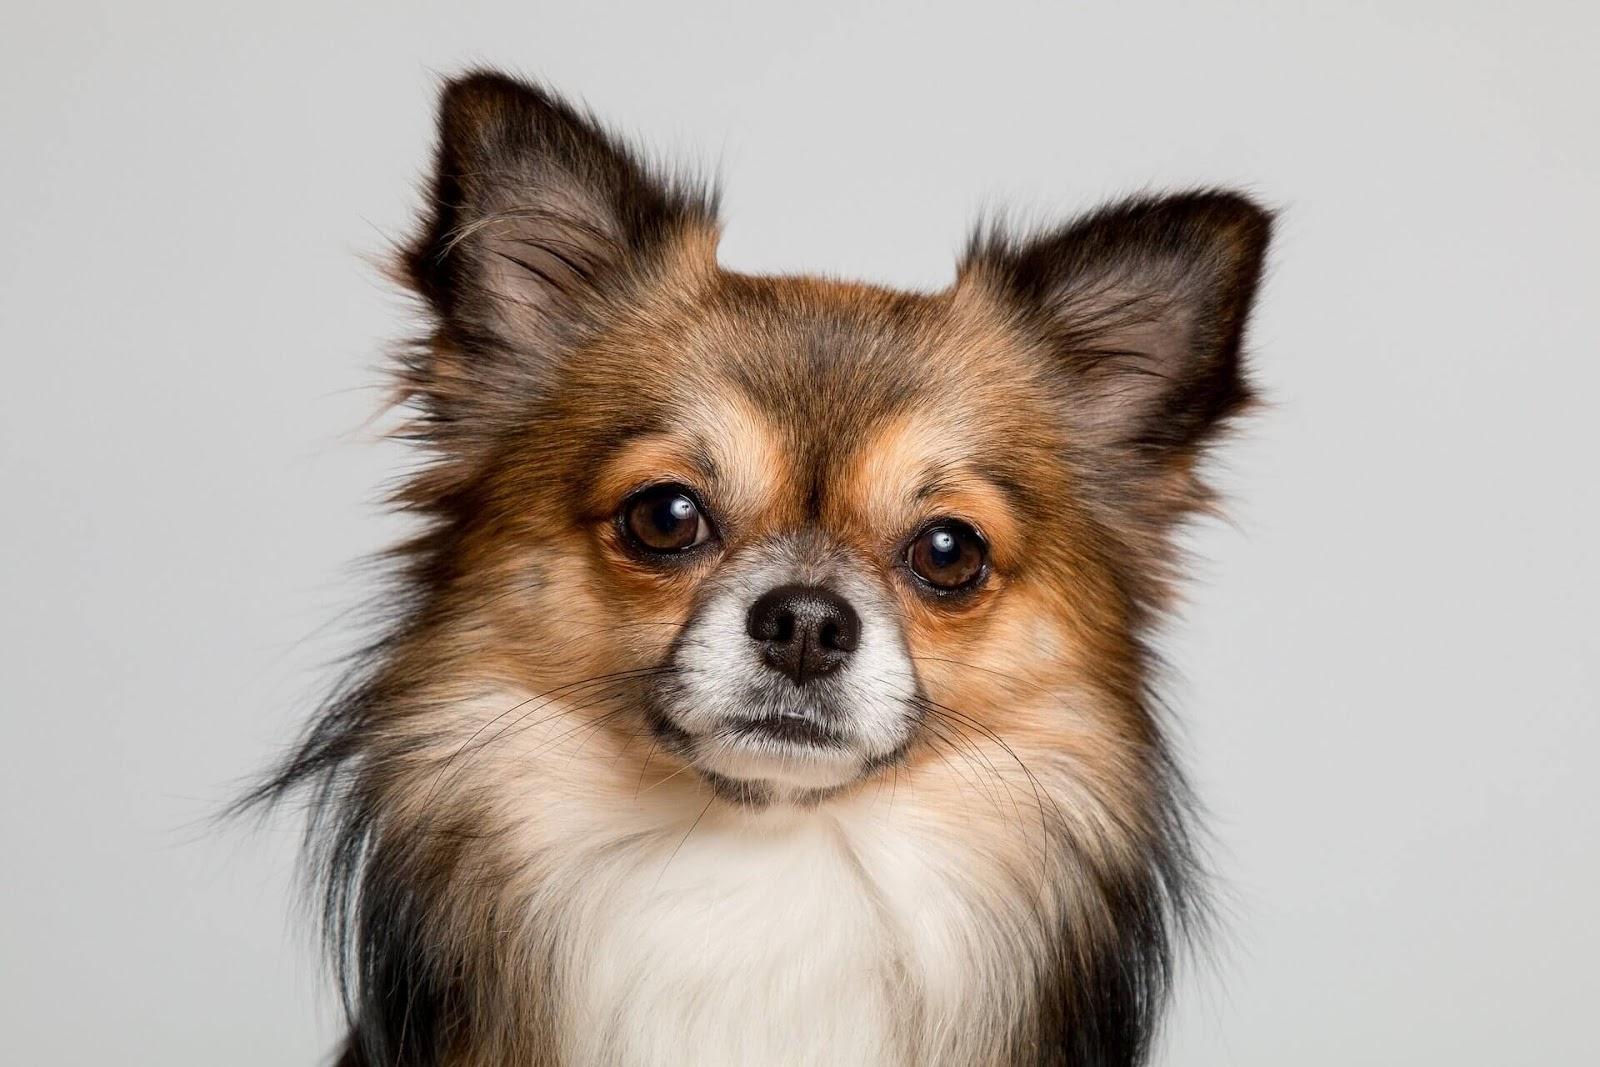 Why Were Chihuahuas Bred?